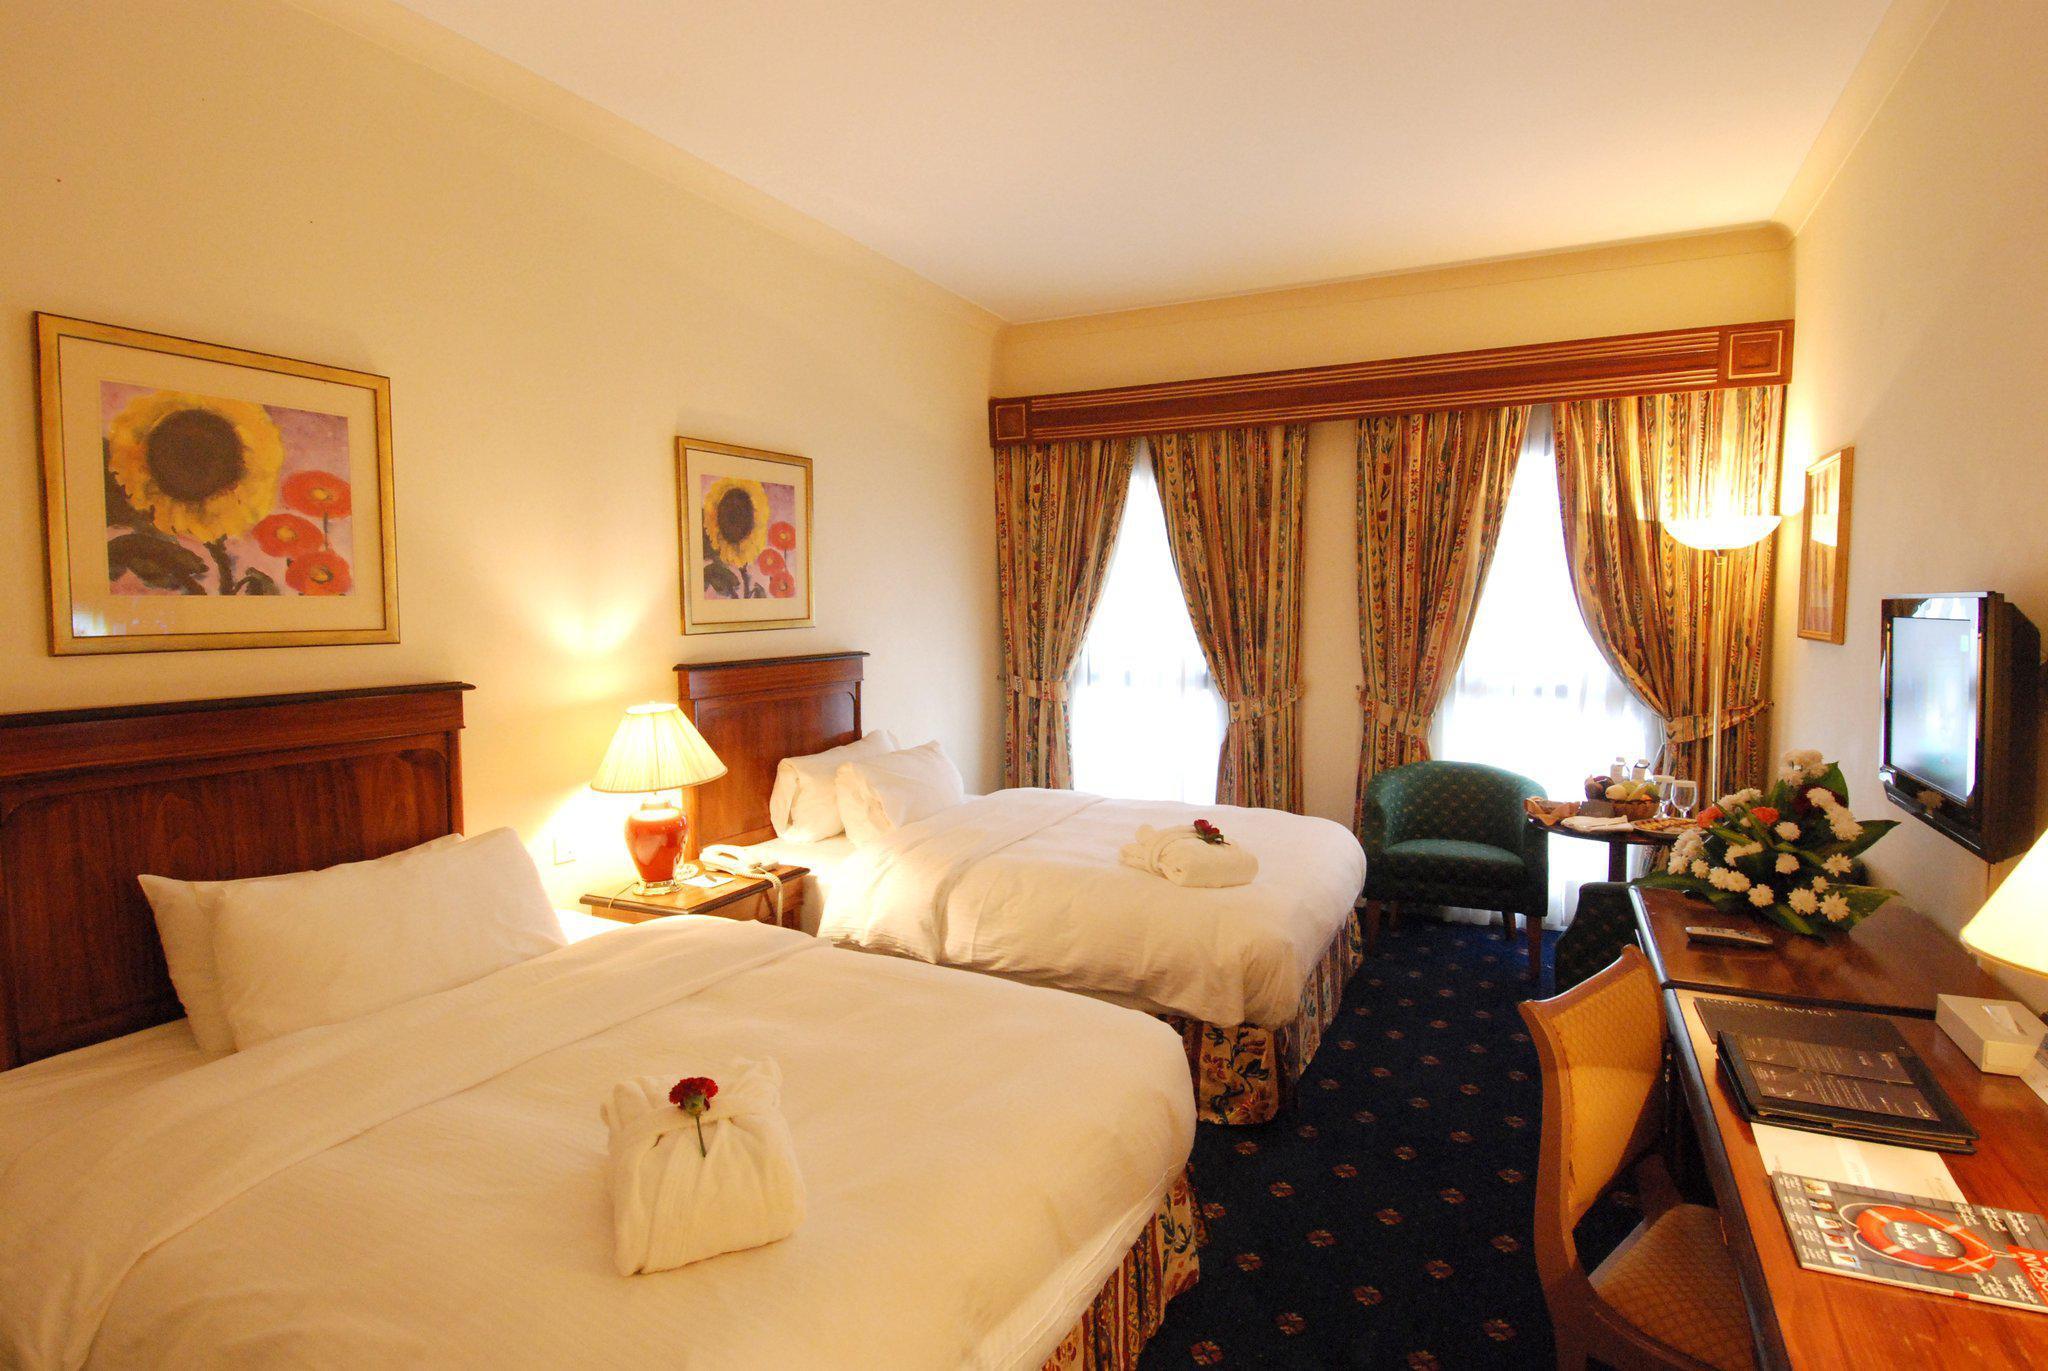 InterContinental Hotels DAR AL Hijra Madinah